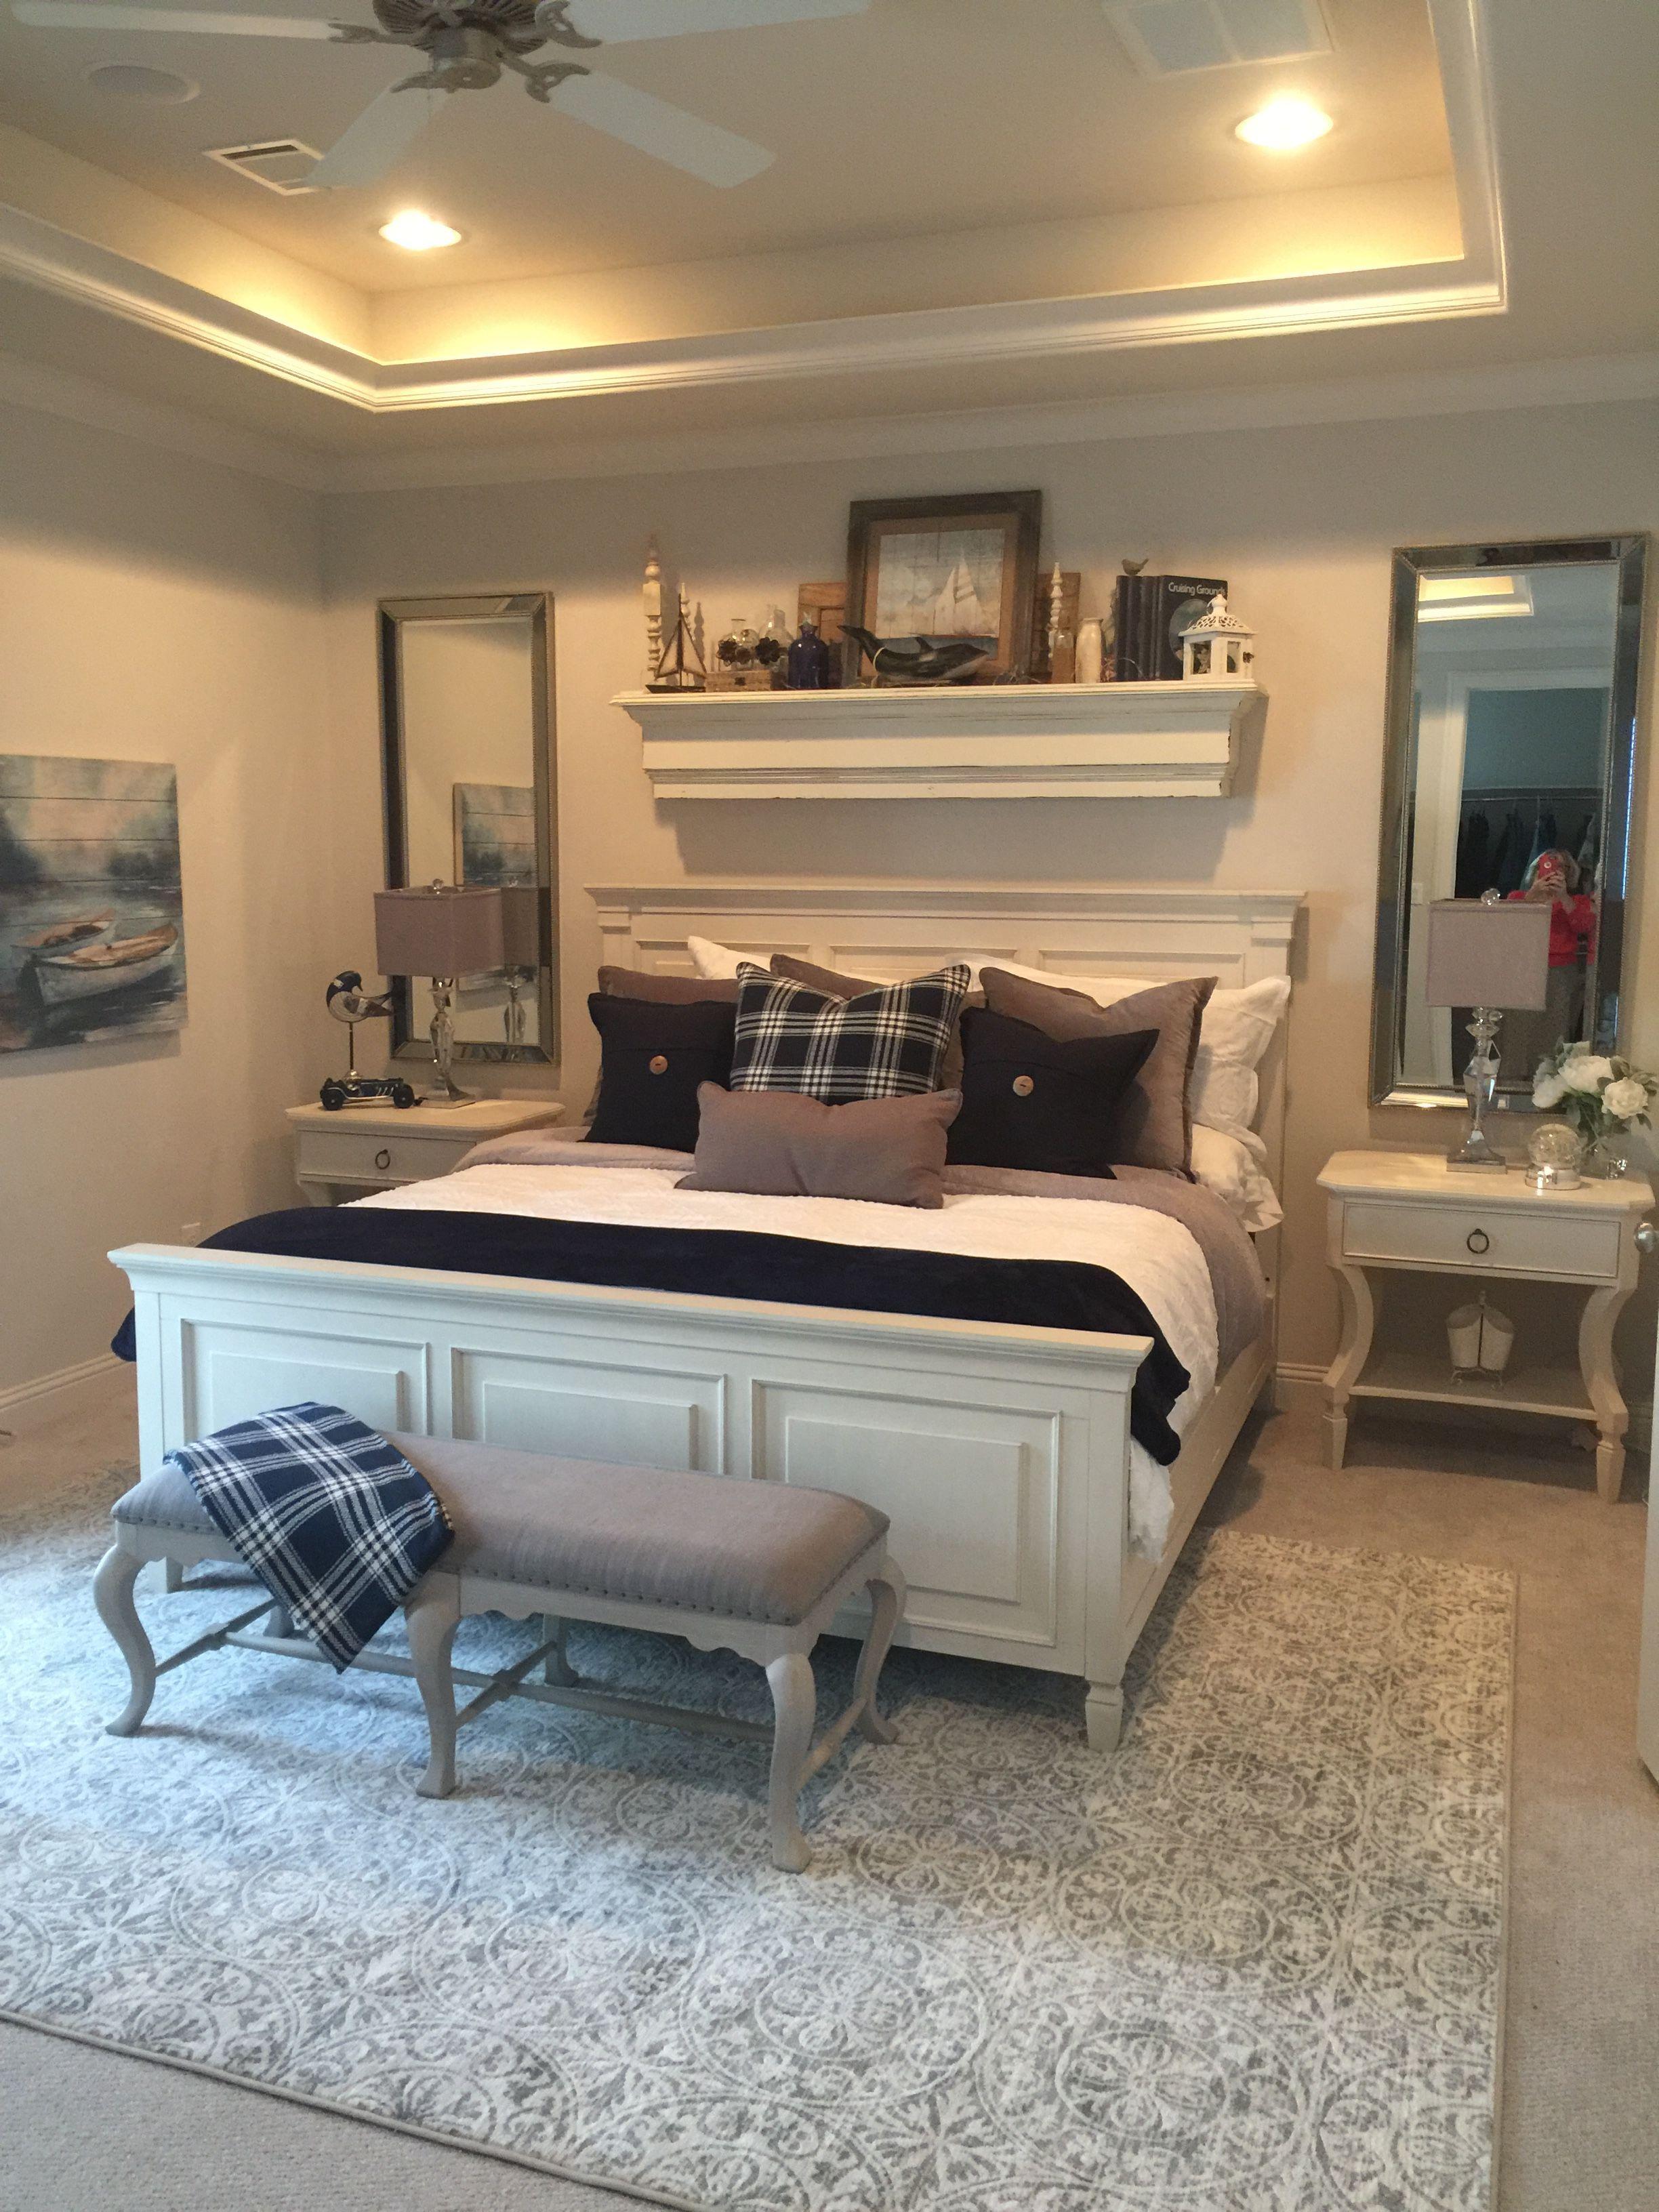 Coastal farmhouse glam master bedroom This was